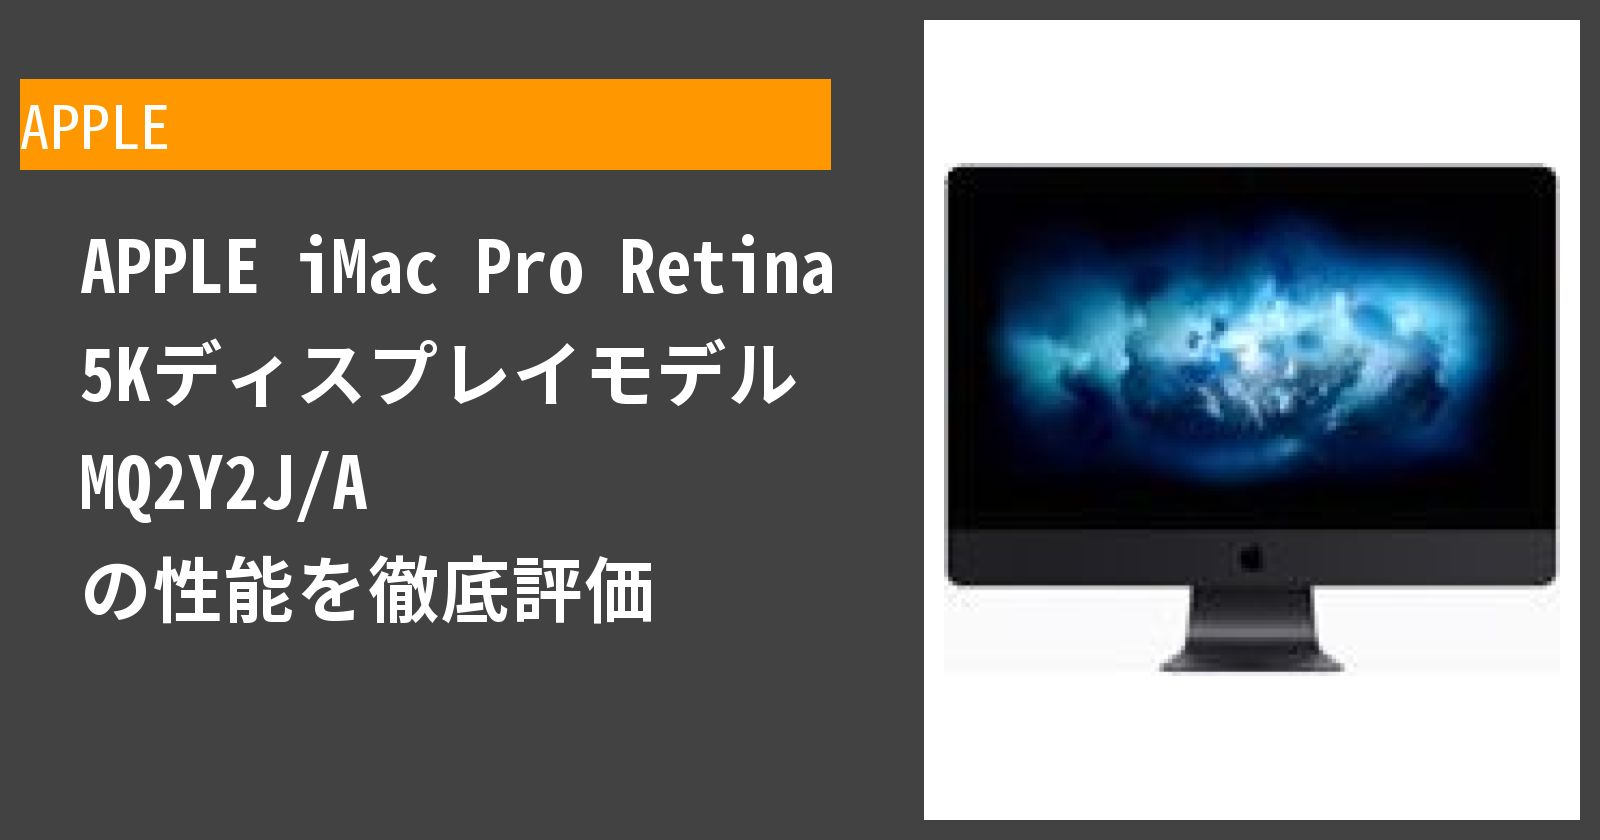 iMac Pro Retina 5K(MQ2Y2J/A) の性能を徹底評価